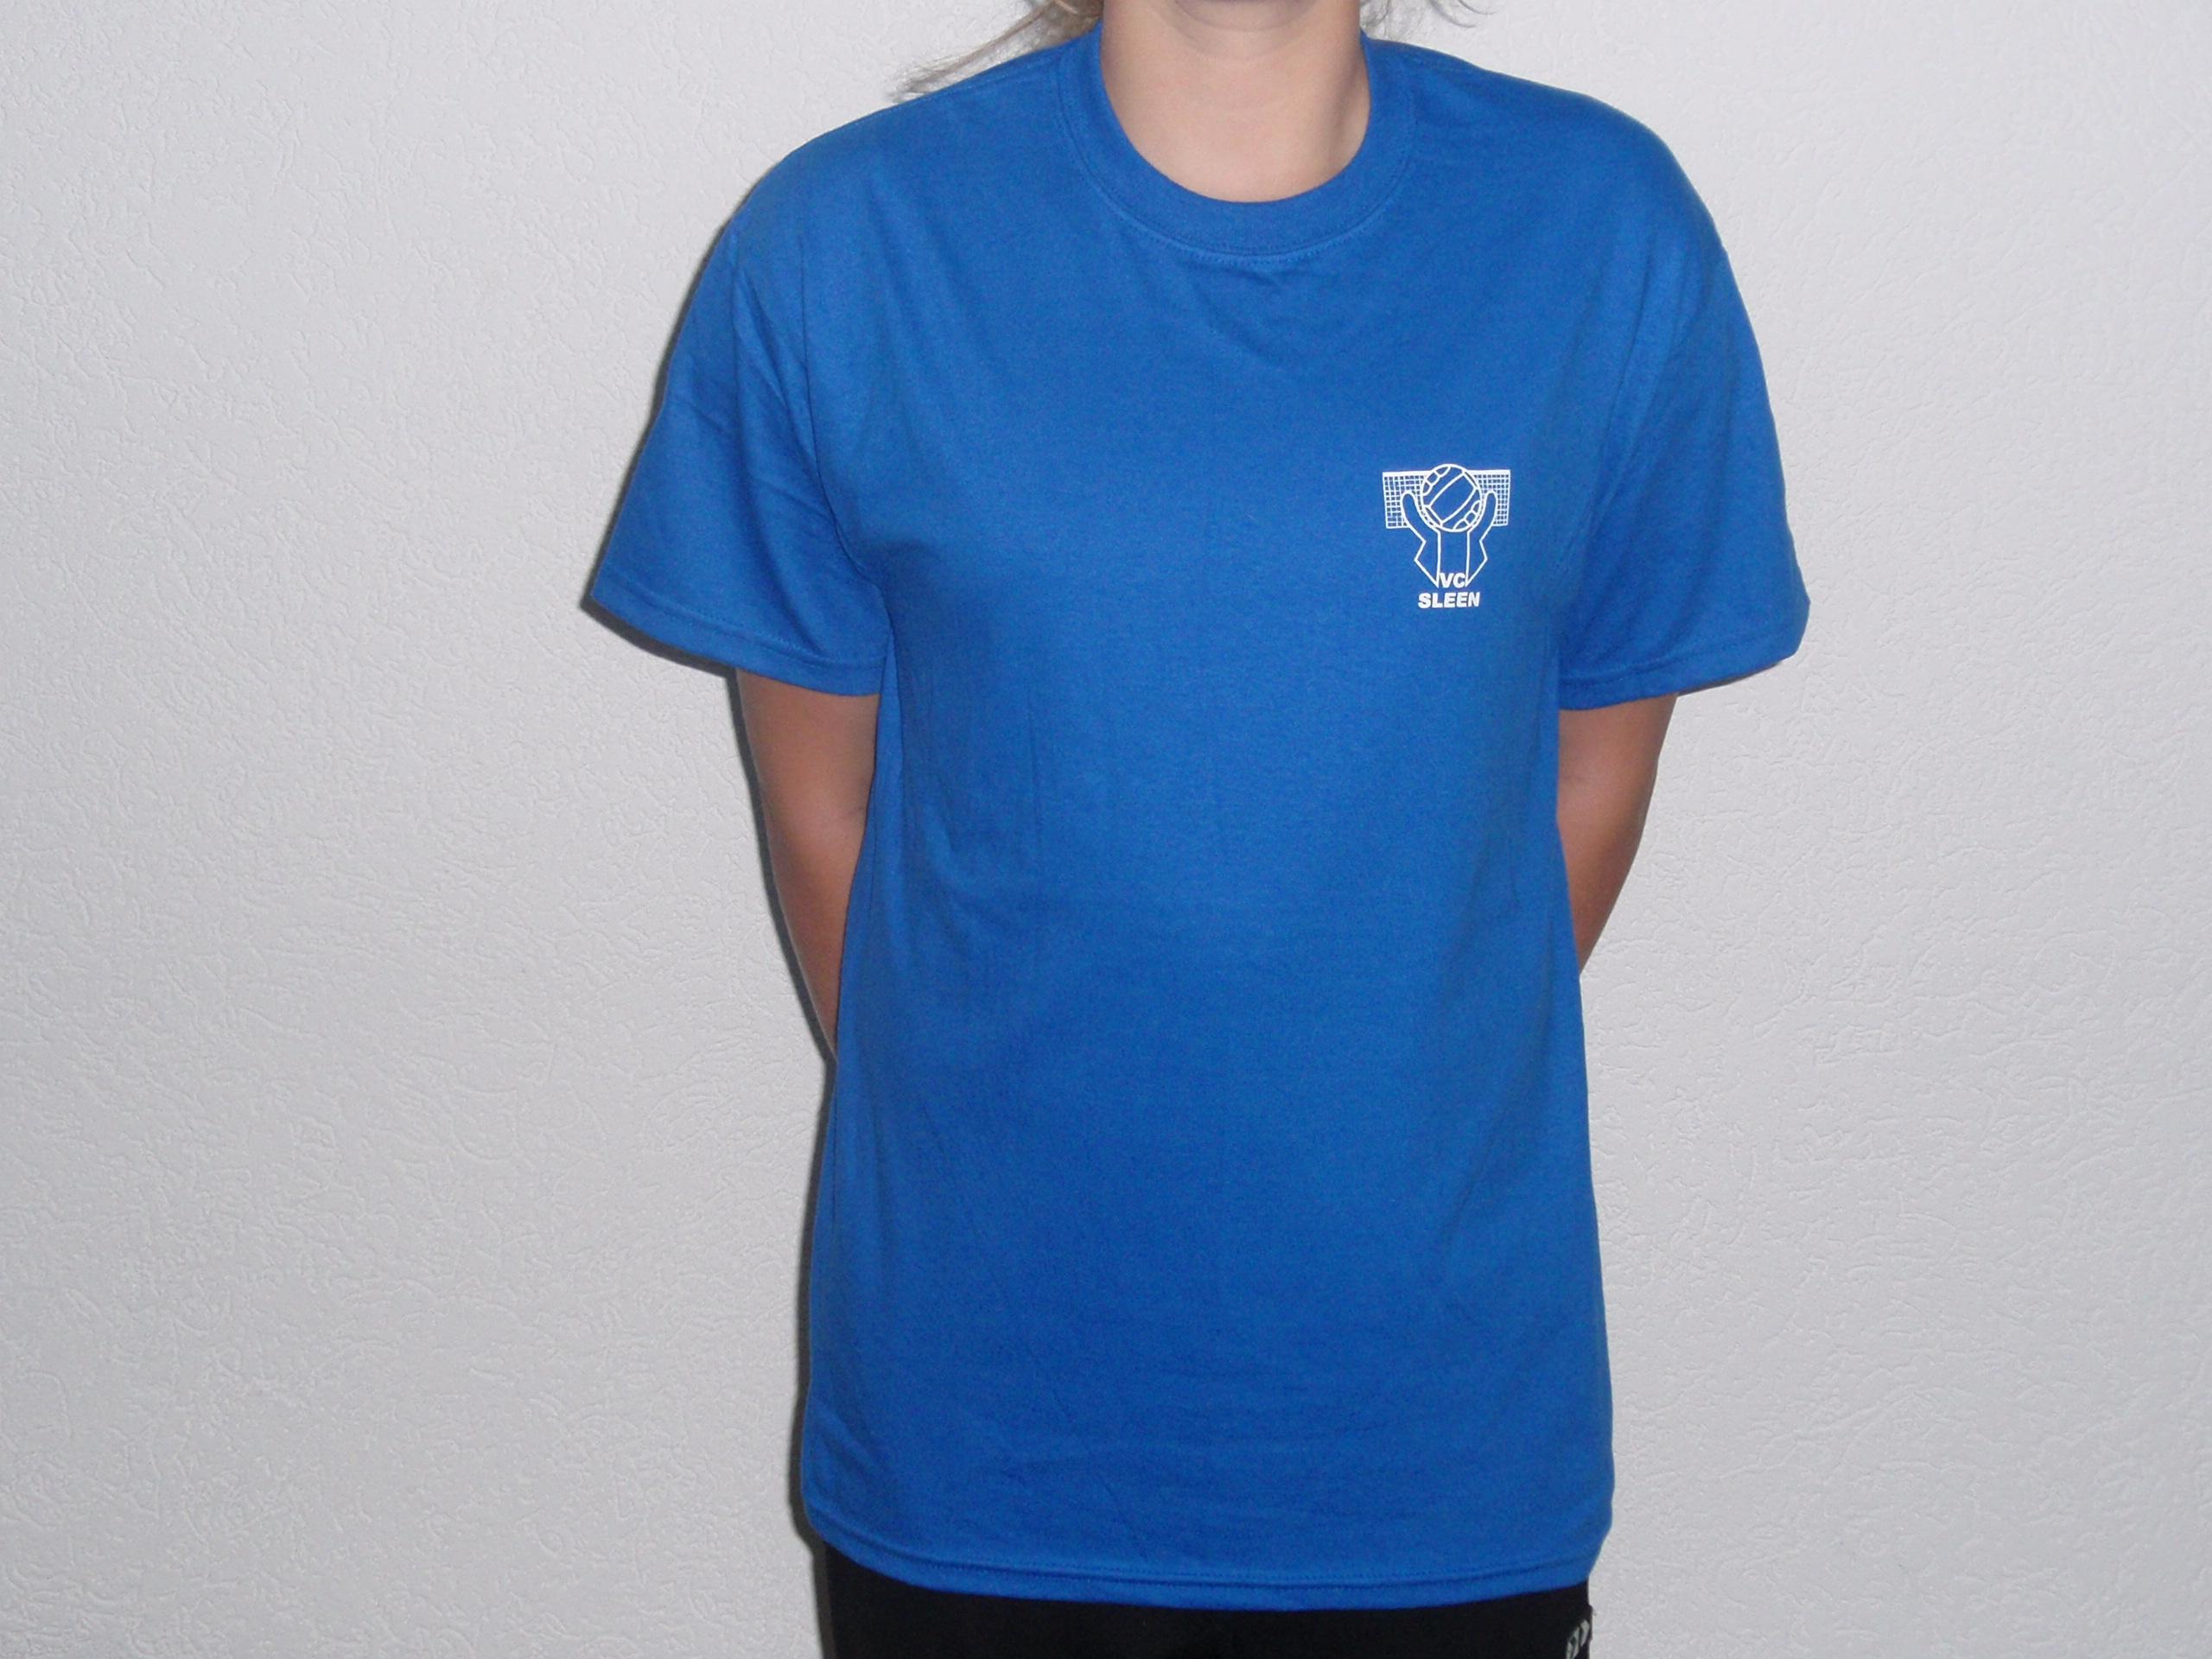 Nieuwe VC trainingsshirts